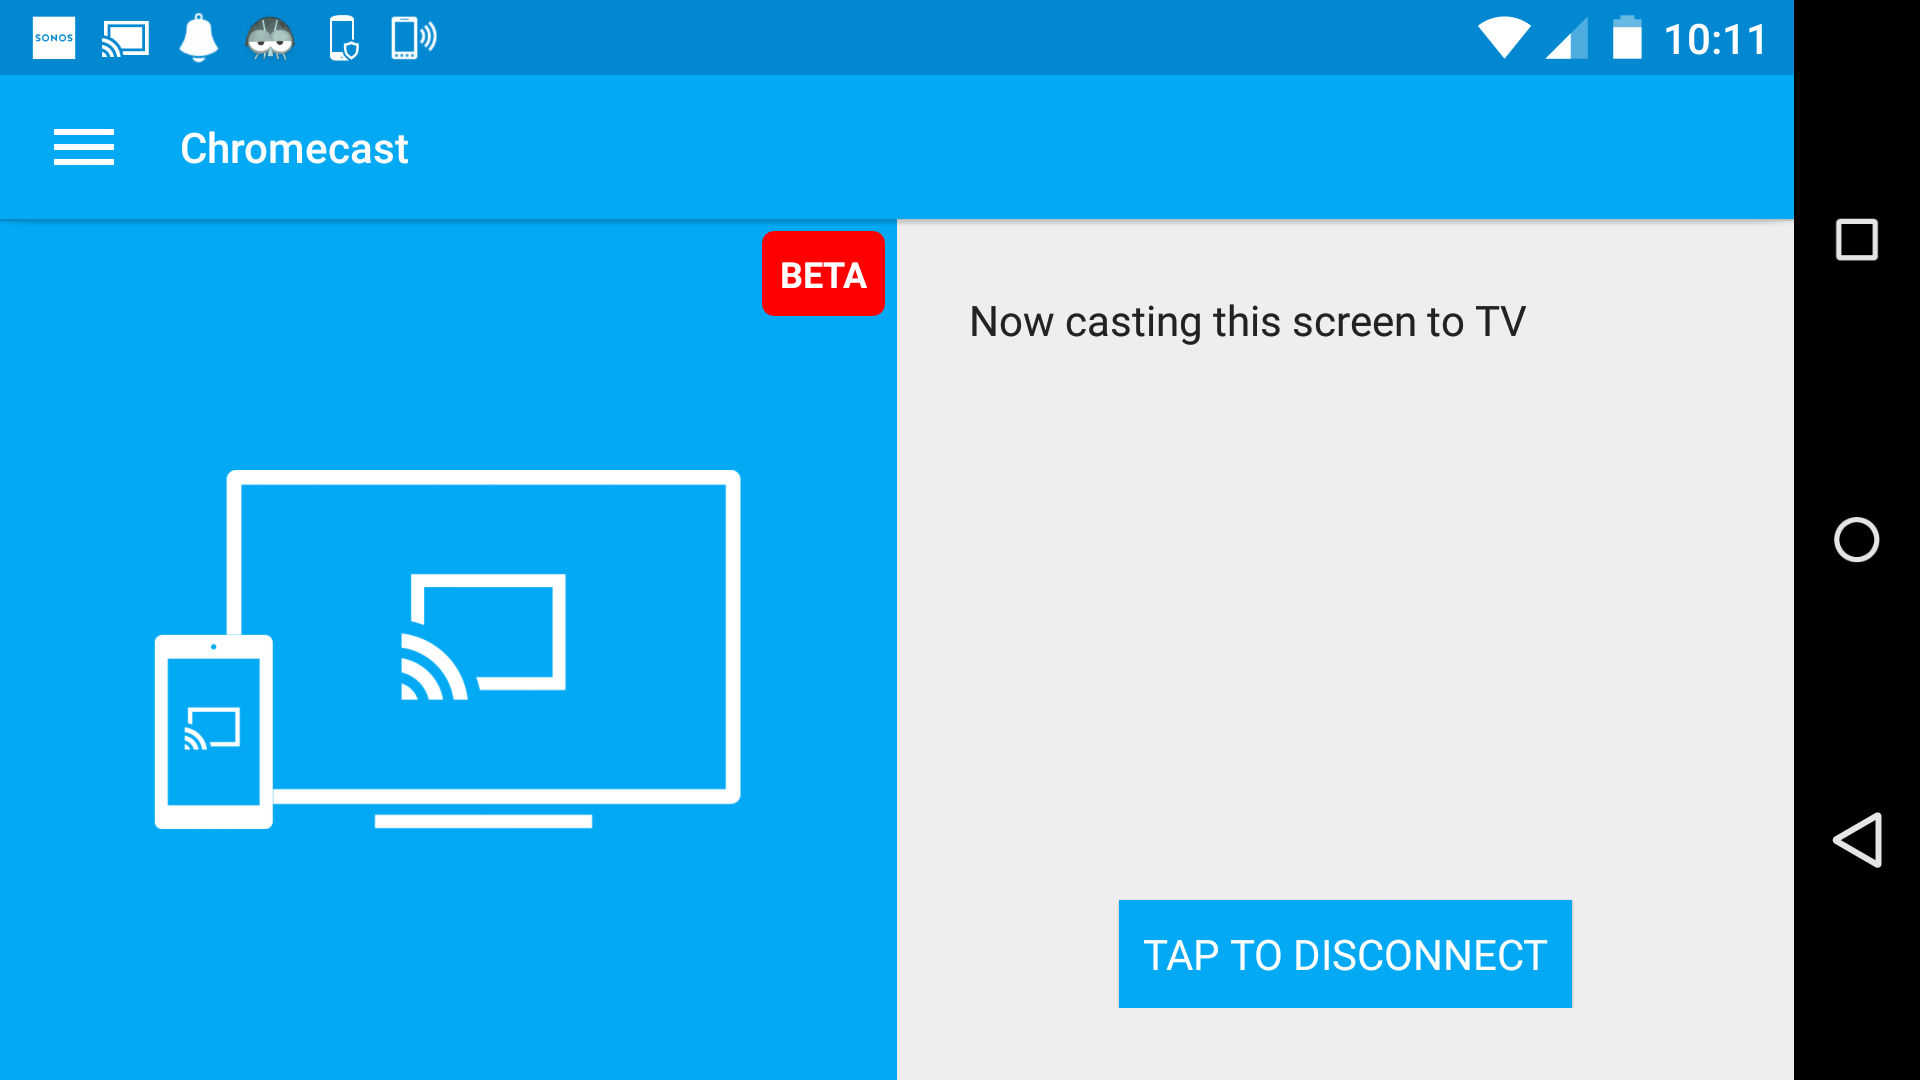 Mirror app for windows 10 | Microsoft's new app will allow